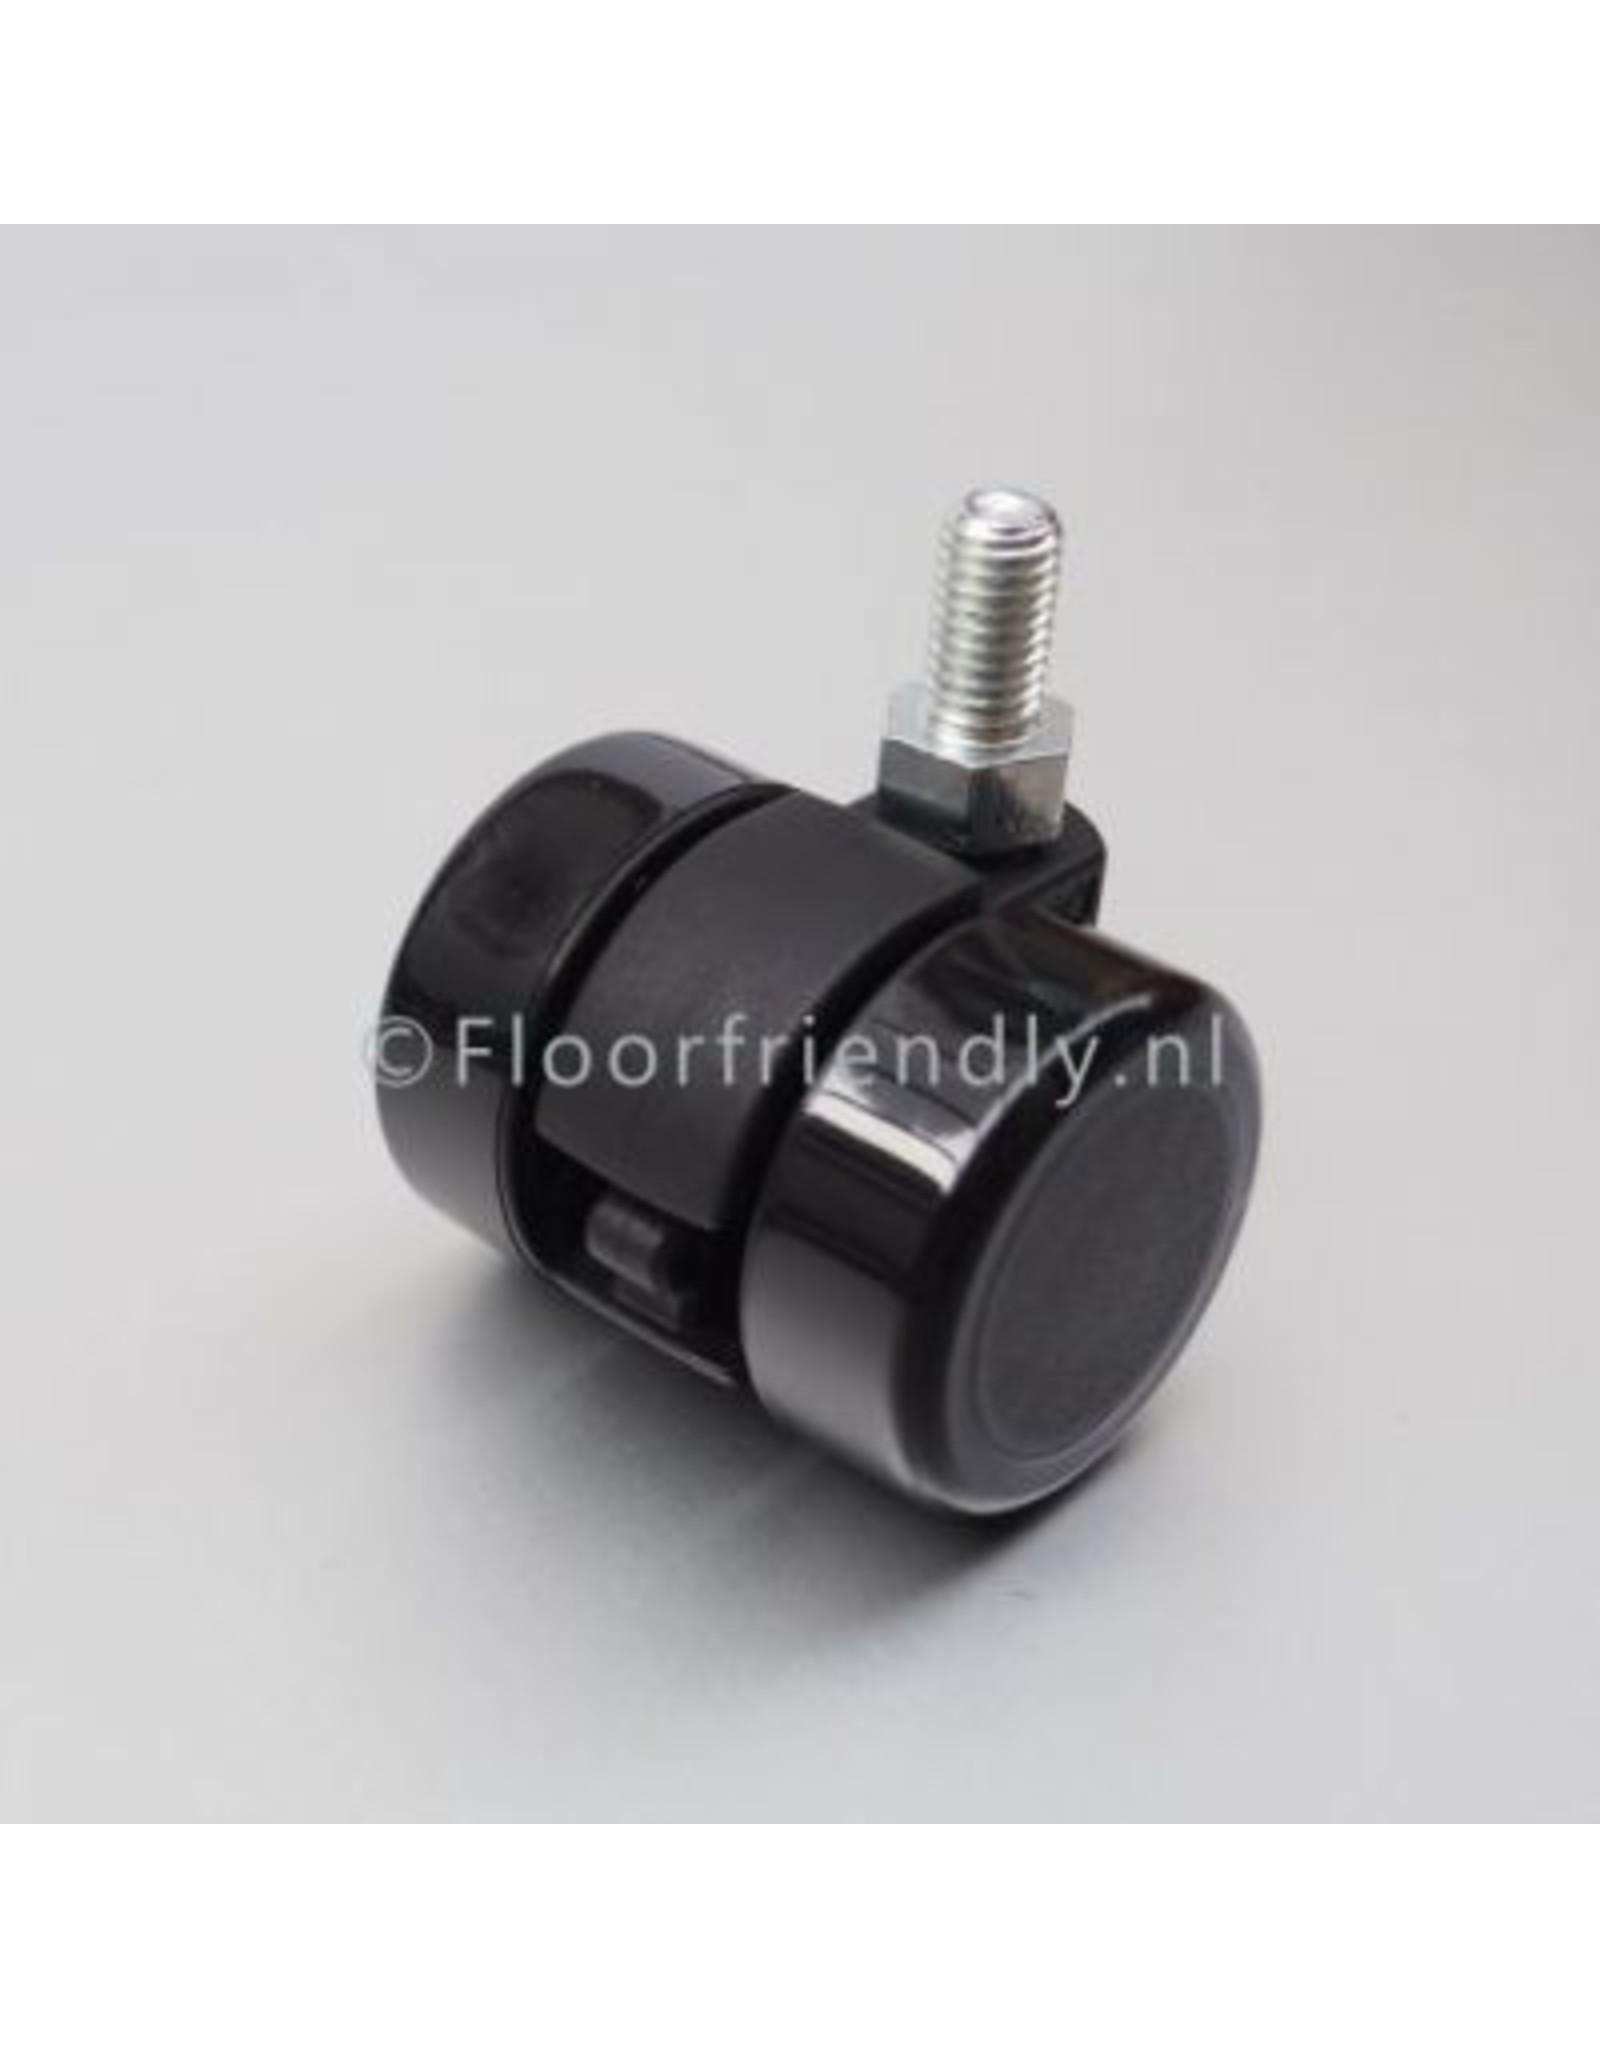 Floorfriendly Zwenkwiel met zachte mantel, 35mm